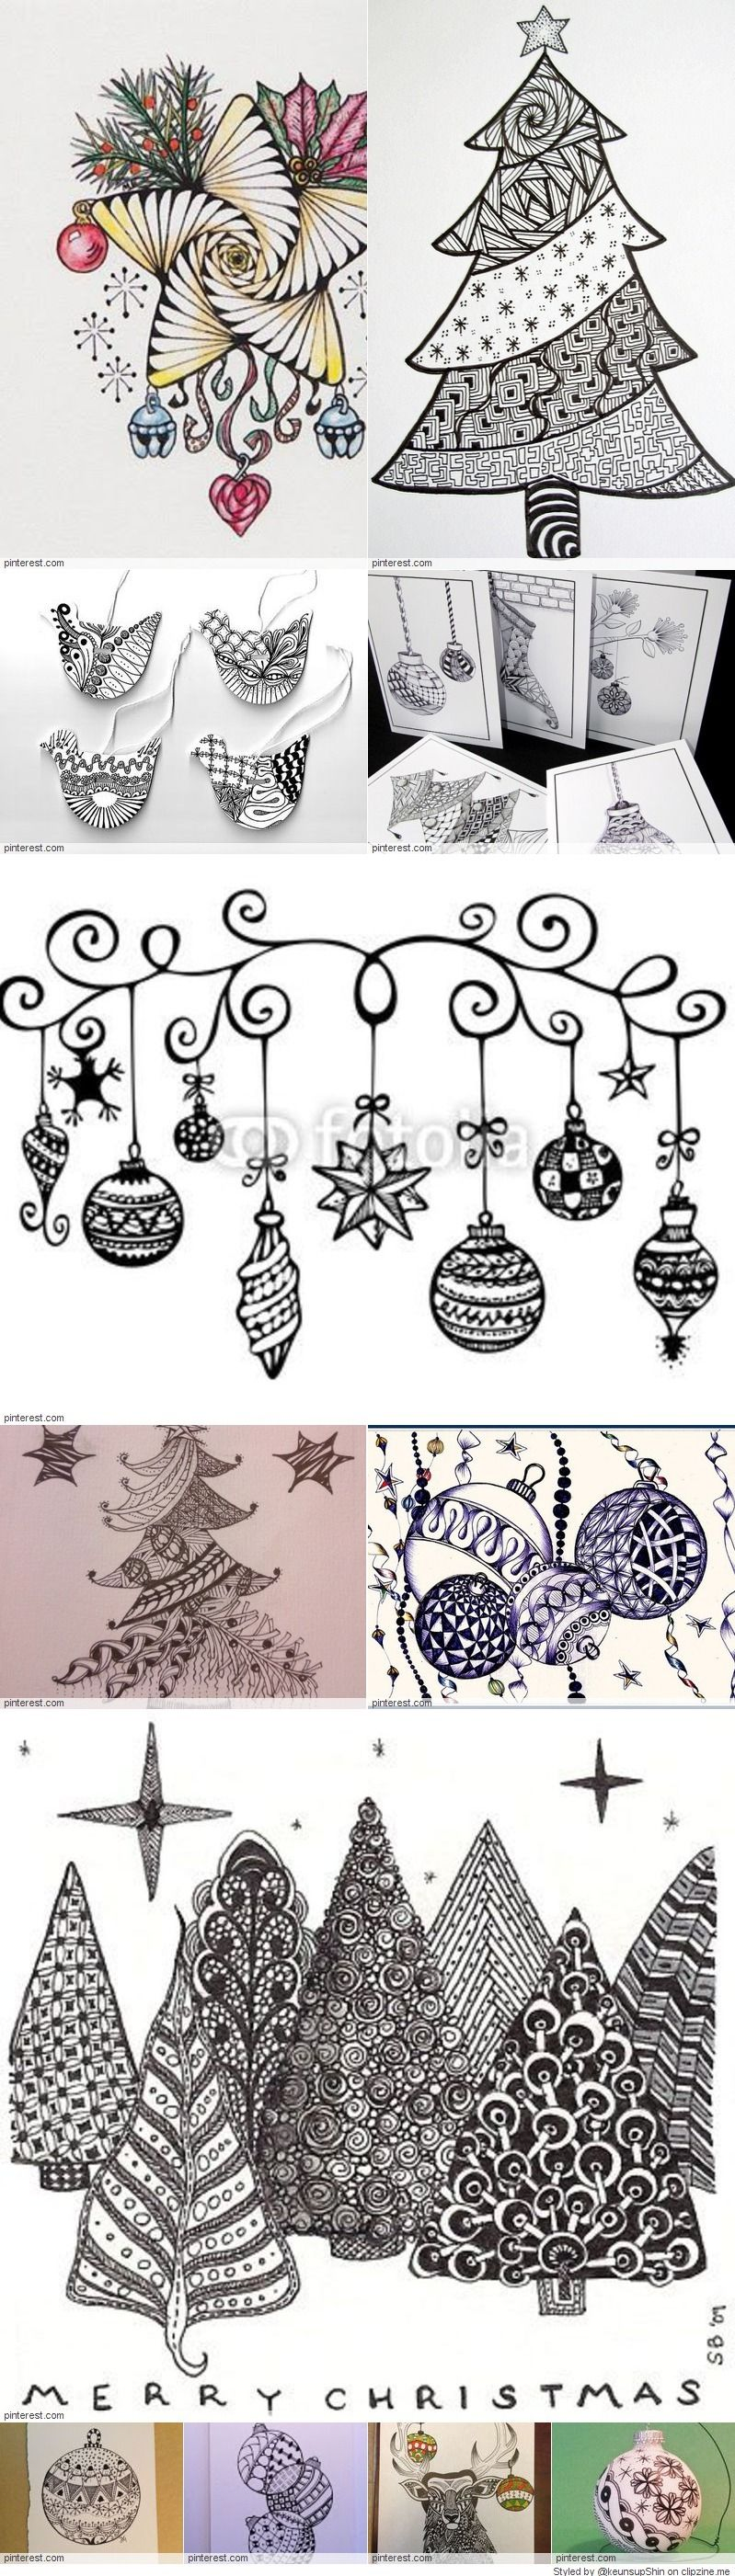 Christmas Zentangle Patterns Zentangle Patterns Zentangle Drawings Zentangle